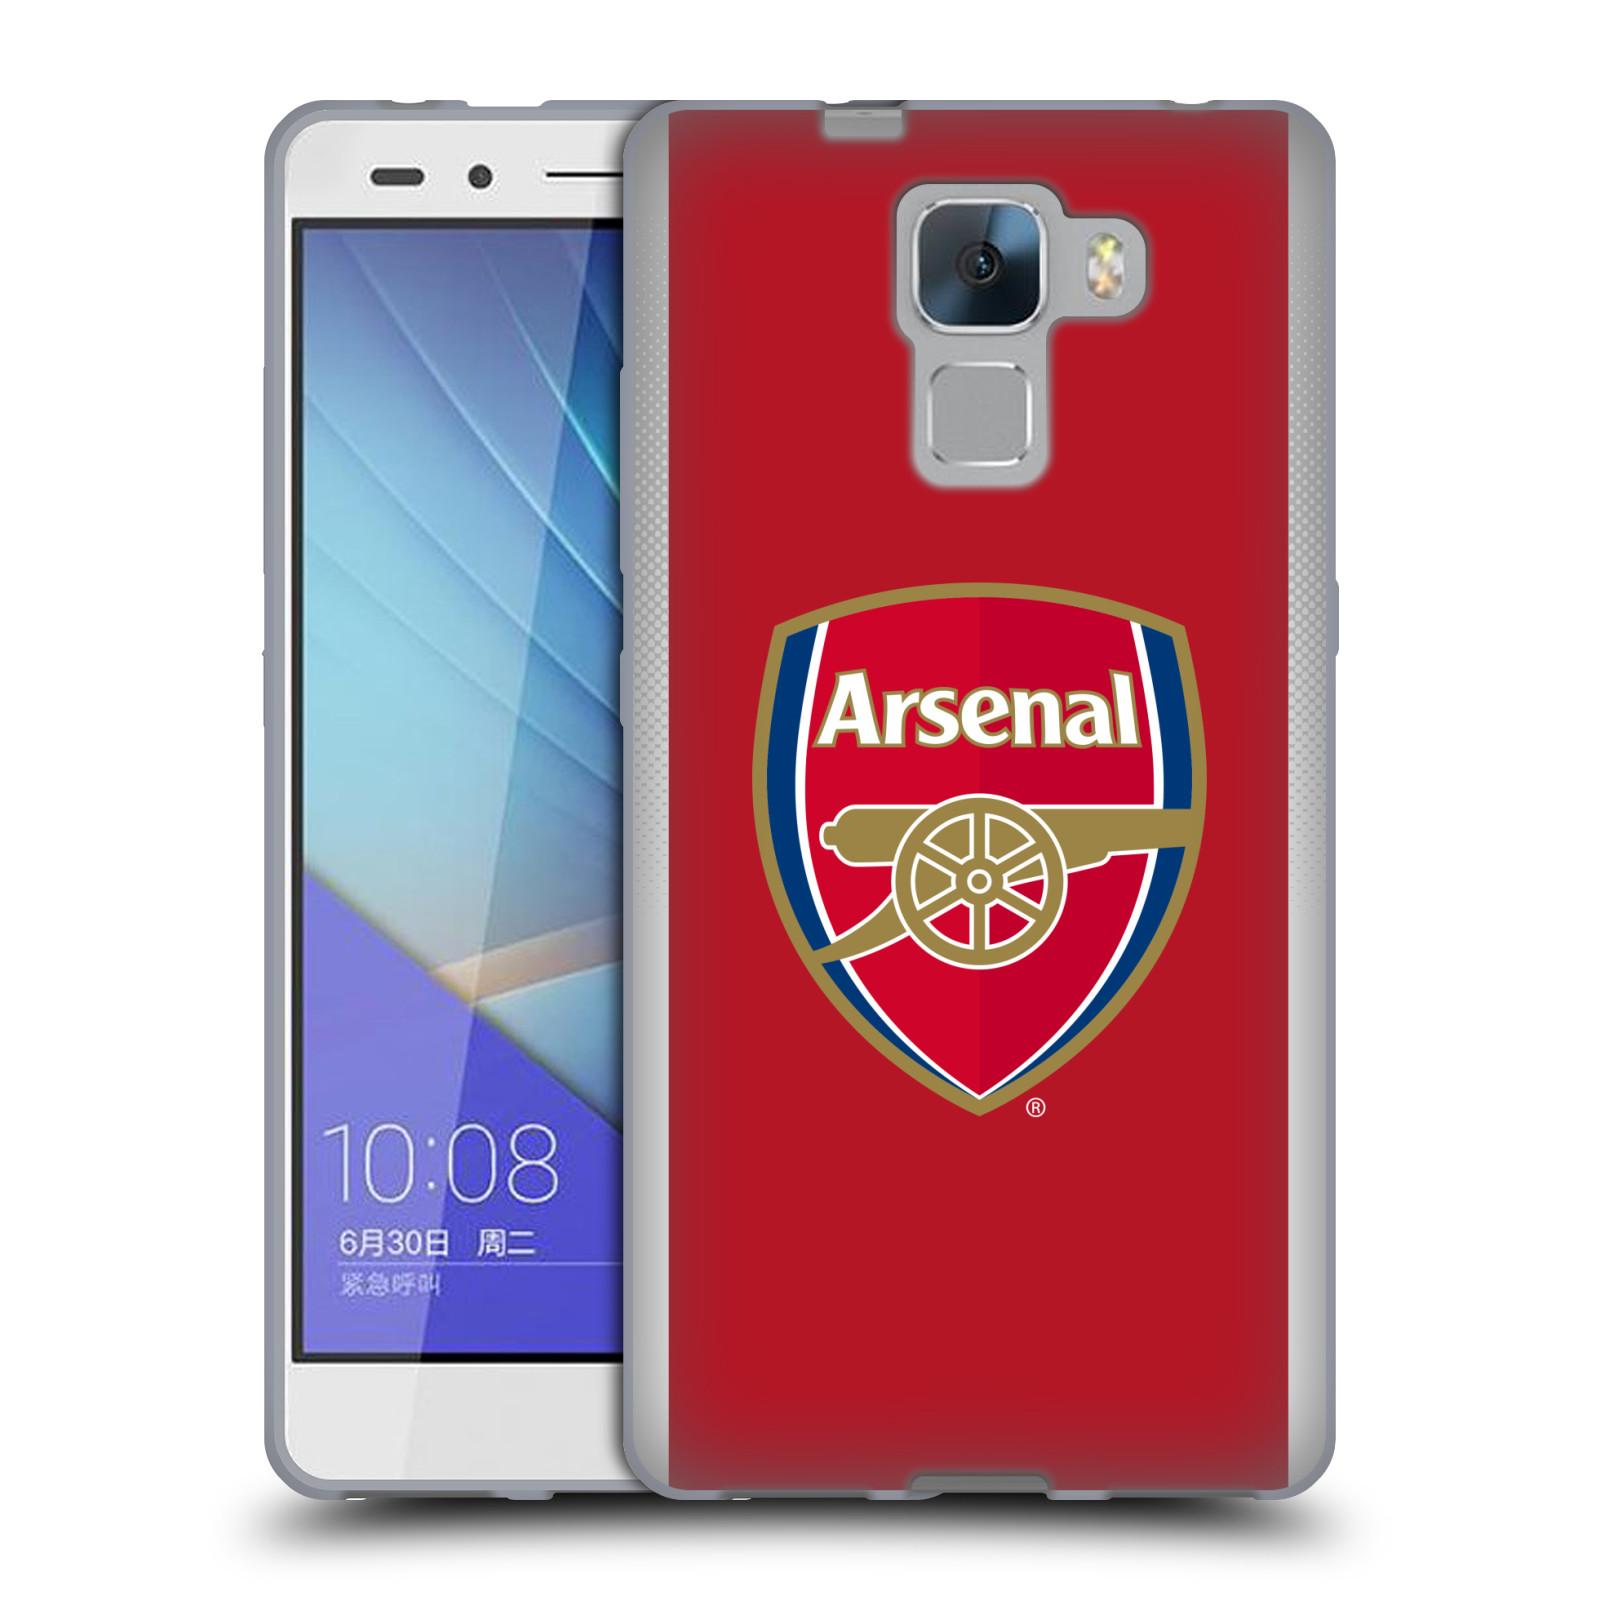 Silikonové pouzdro na mobil Honor 7 - Head Case - Arsenal FC - Logo klubu